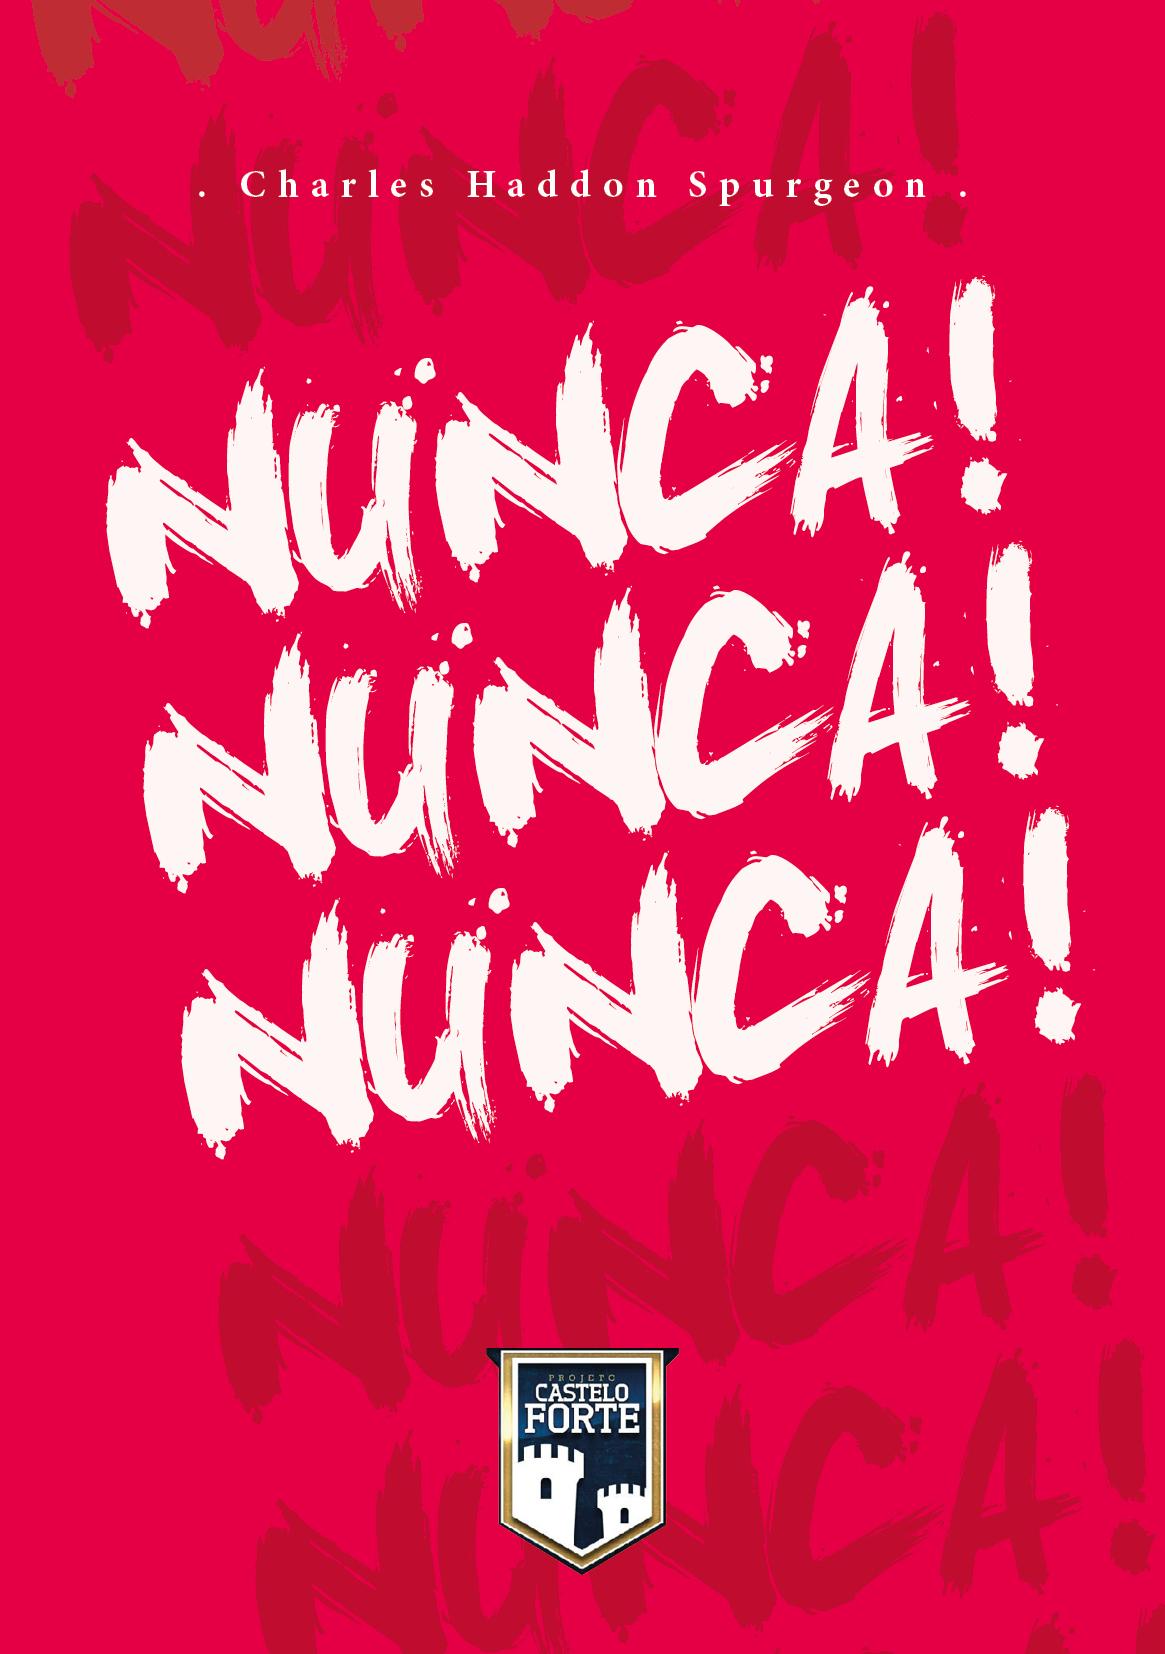 CAPA-nunca-nunca-nunca2